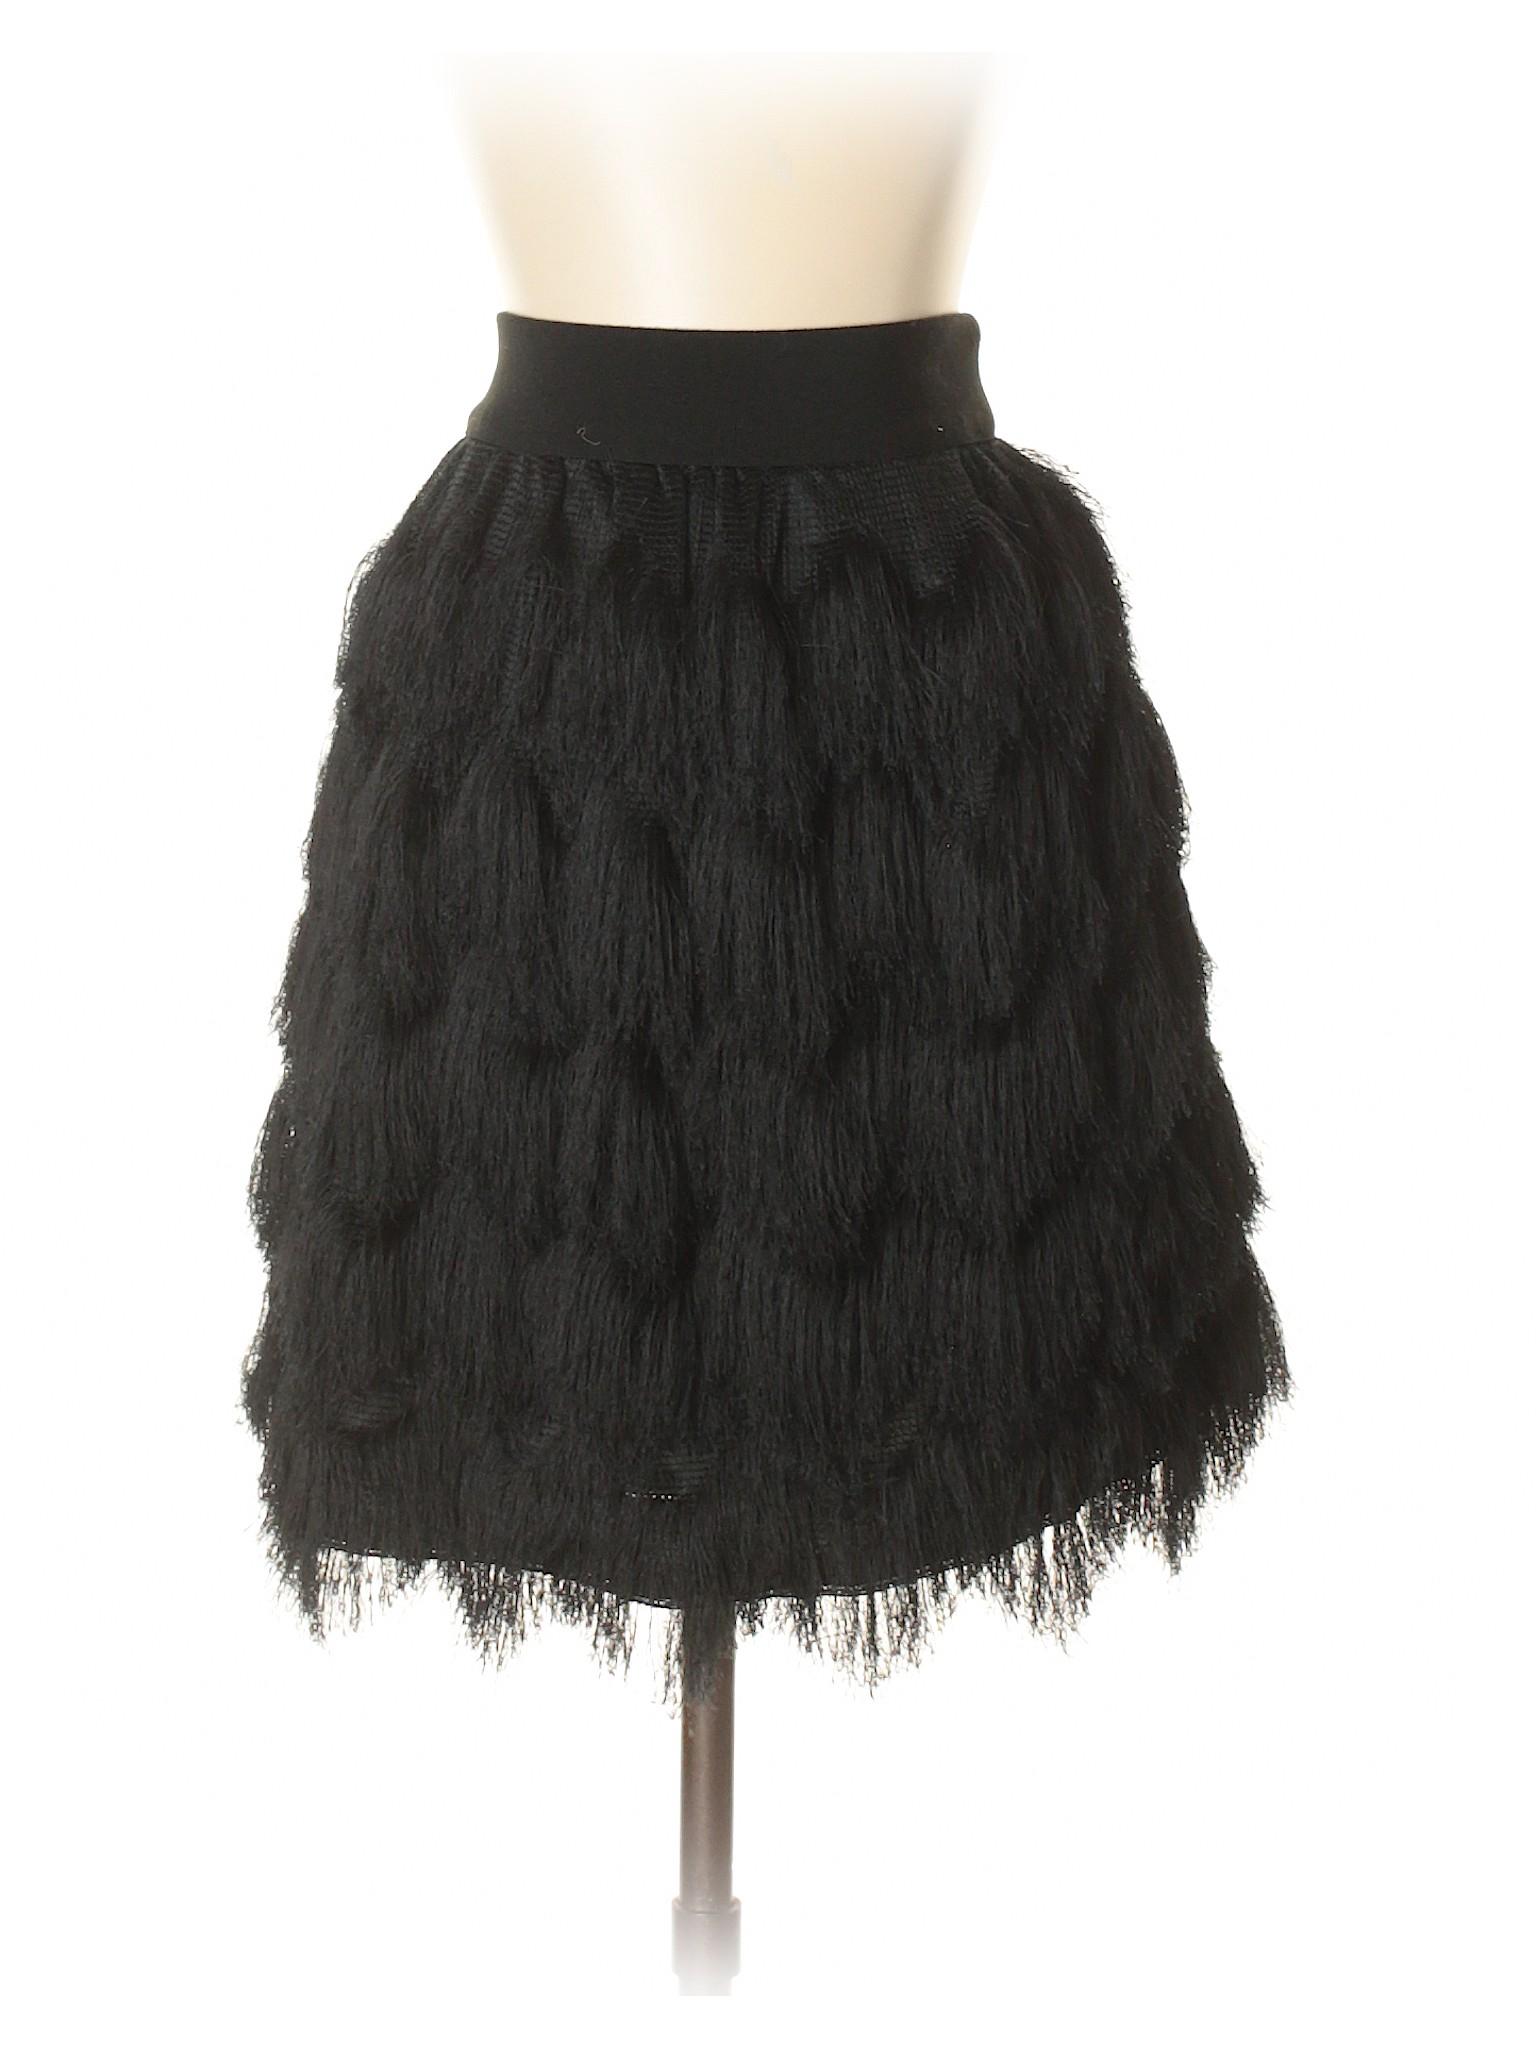 Banana winter Skirt Republic Leisure Formal nxT0P6Wq